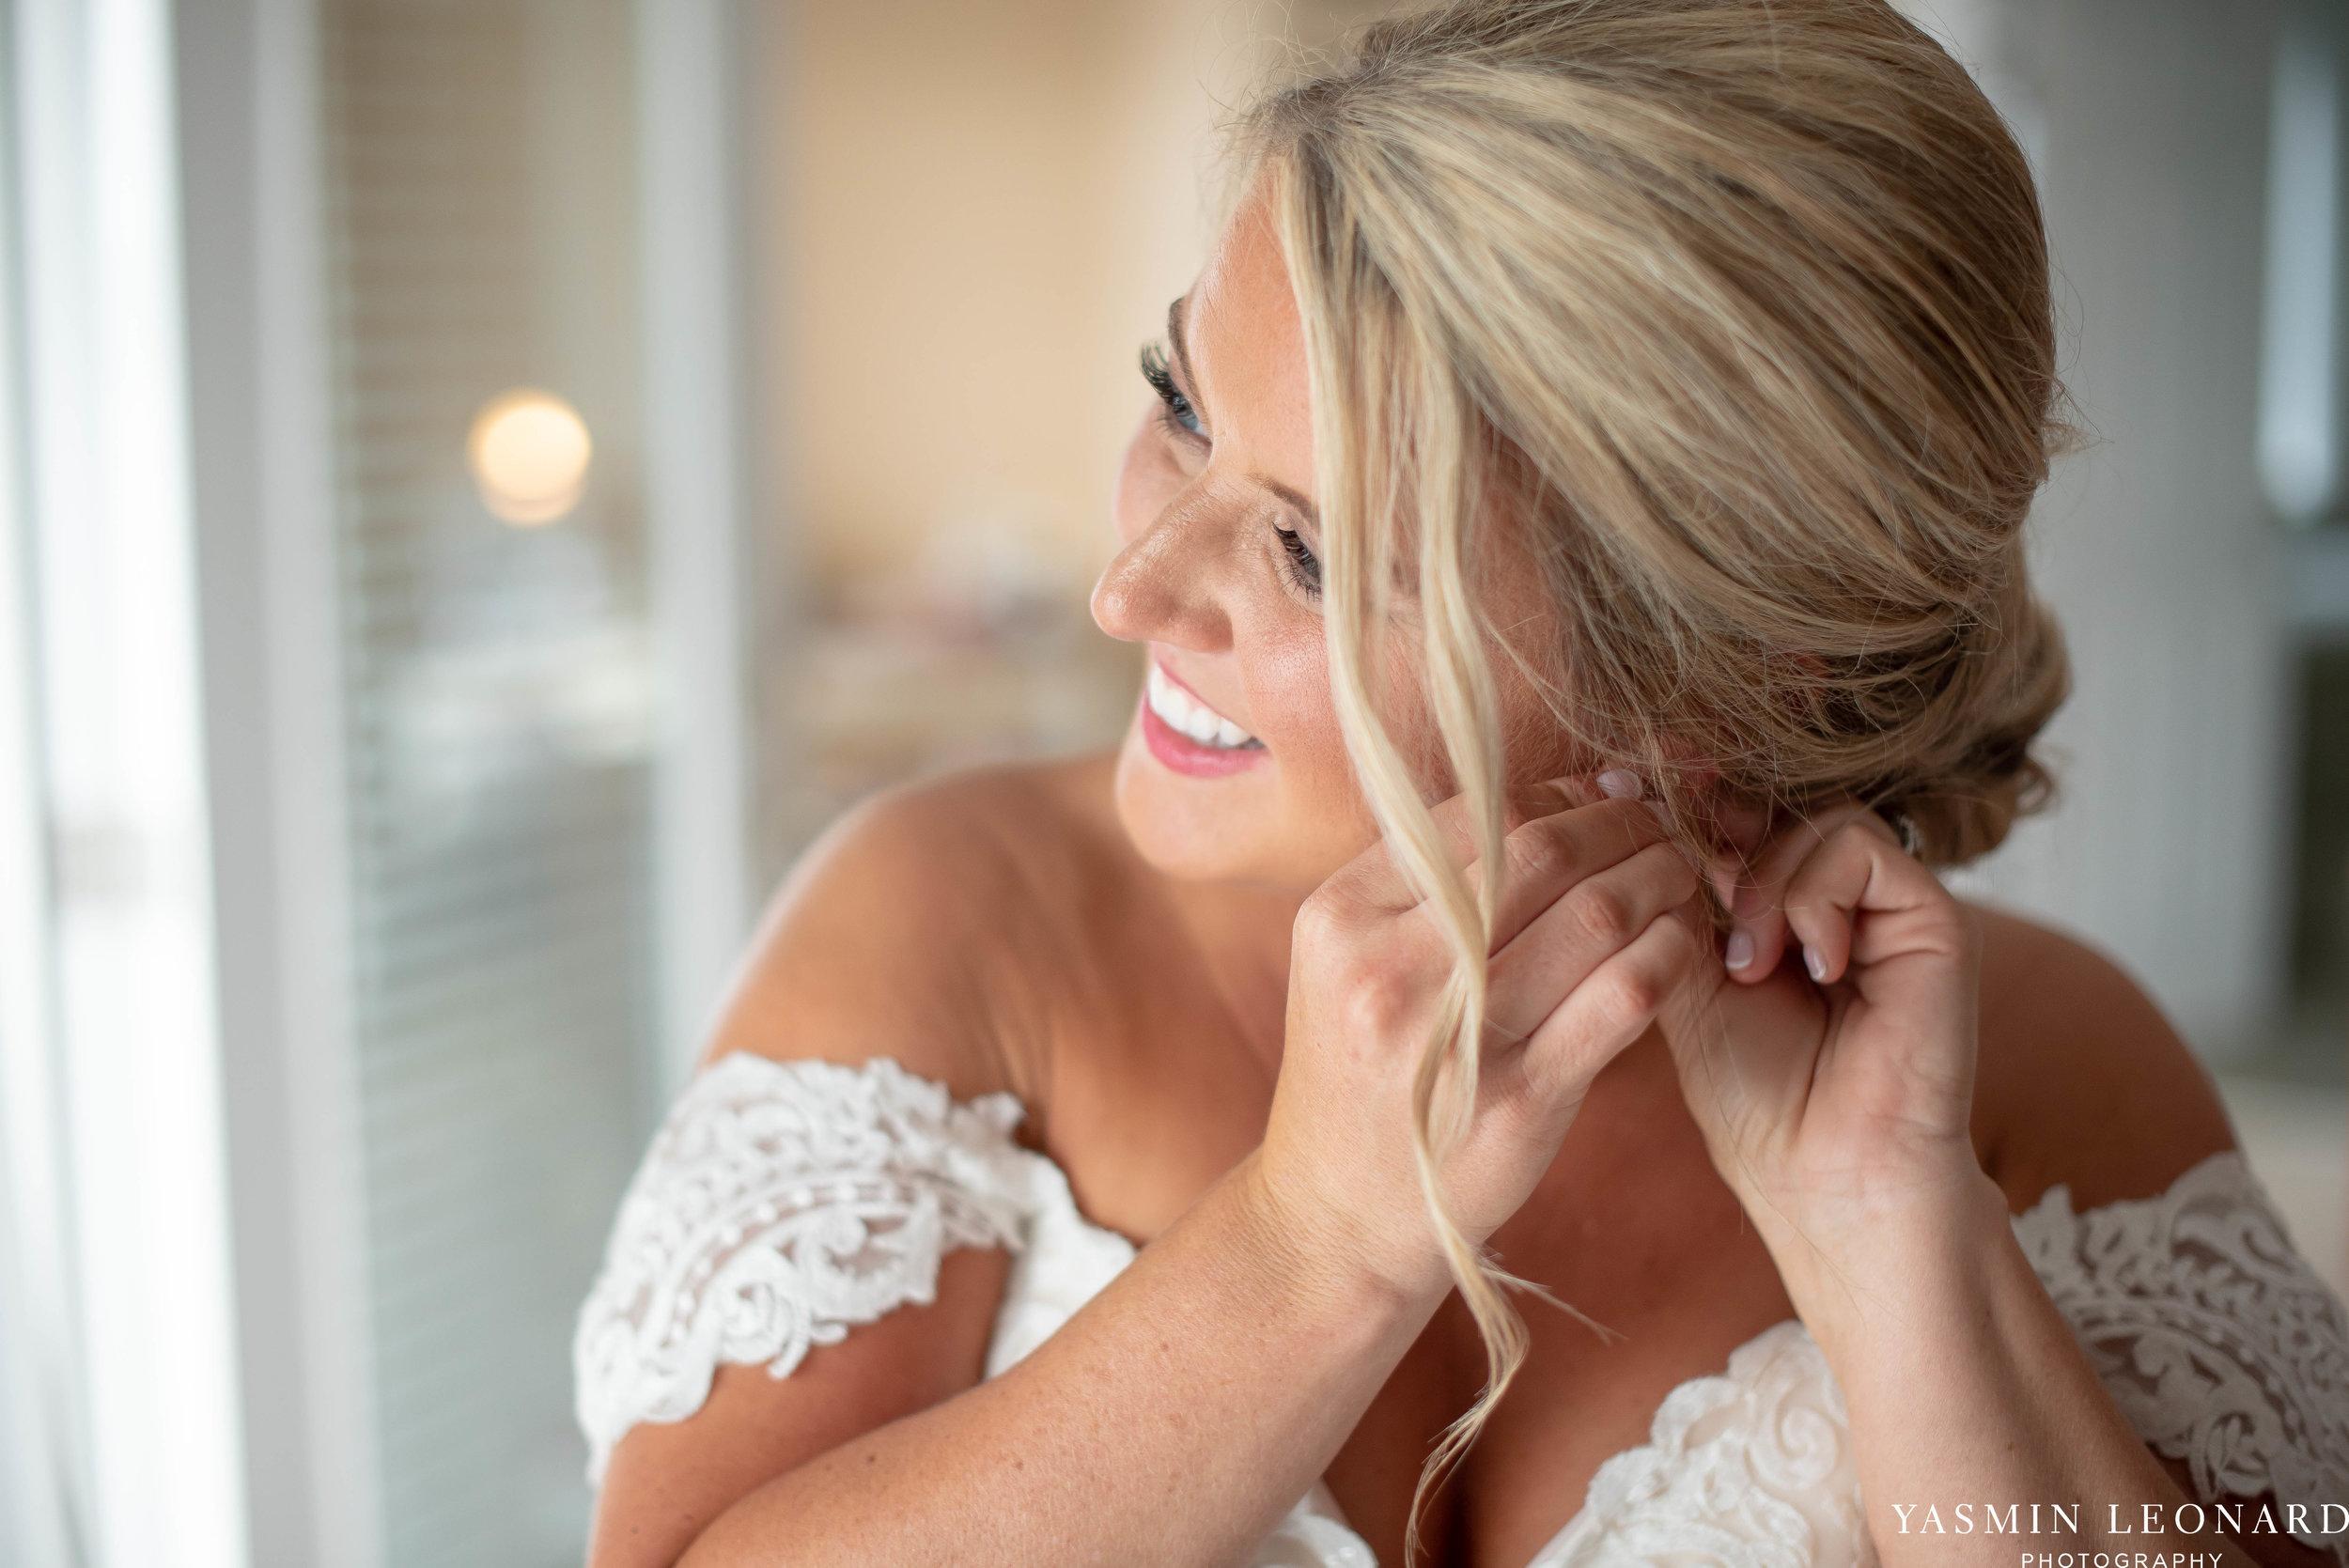 Carolina Beach Wedding - Fort Fisher Wedding - NC Acquarium - Beach Wedding - NC Wedding - Beach Wedding Inspiration - Beach Bride-1.jpg